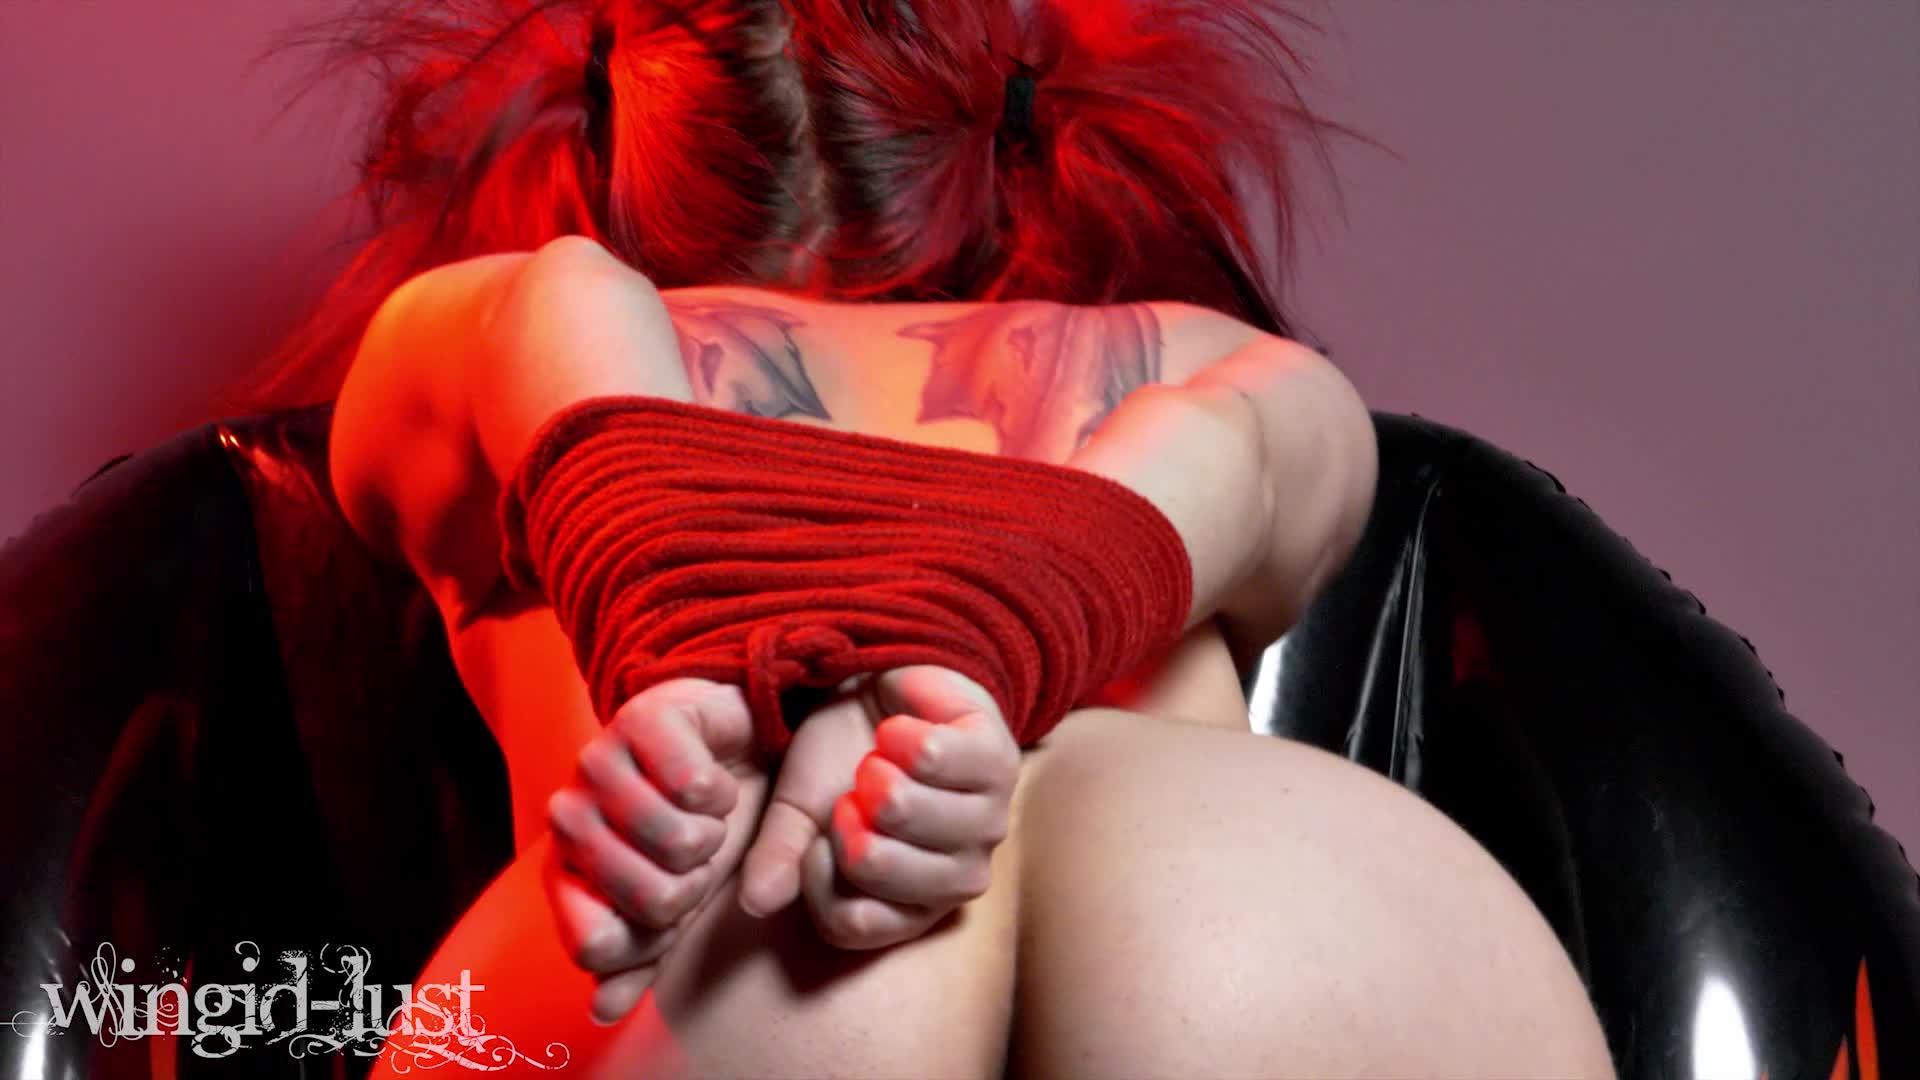 WingID_Lust'd vid